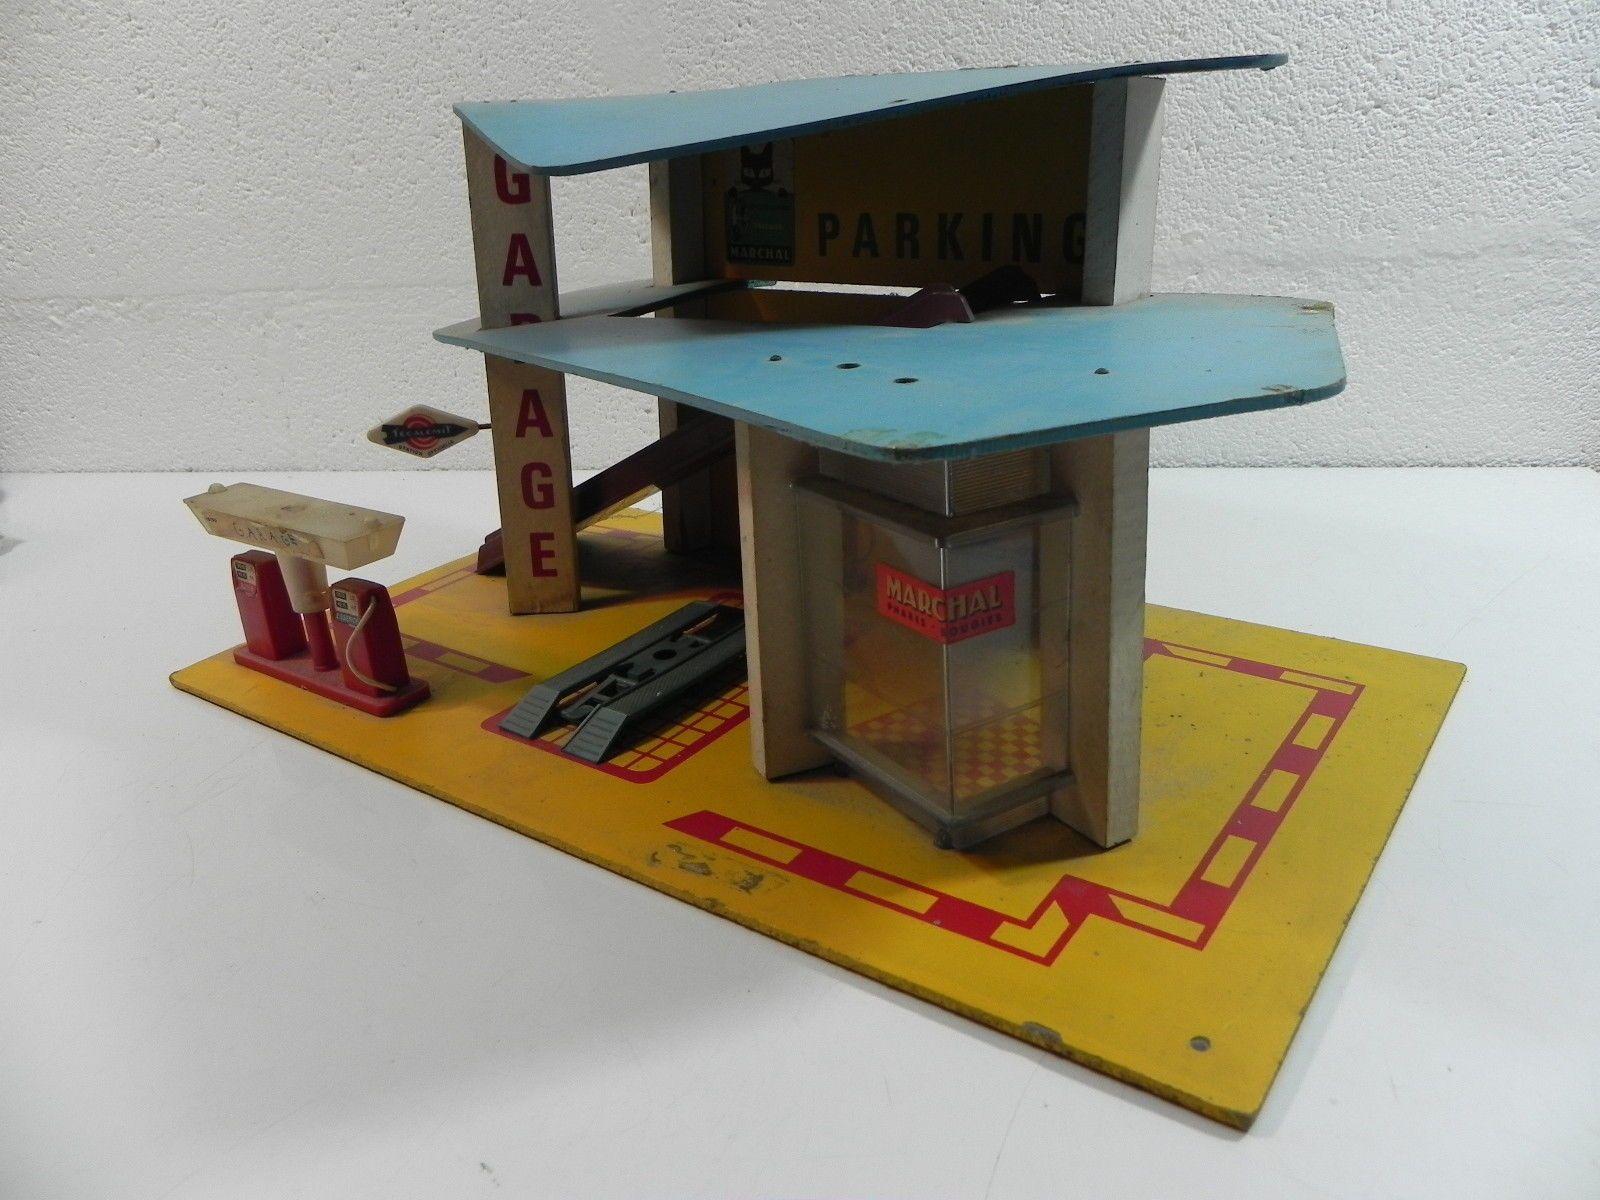 Garage Ancien Station Service Telecamit Marchal 1 43